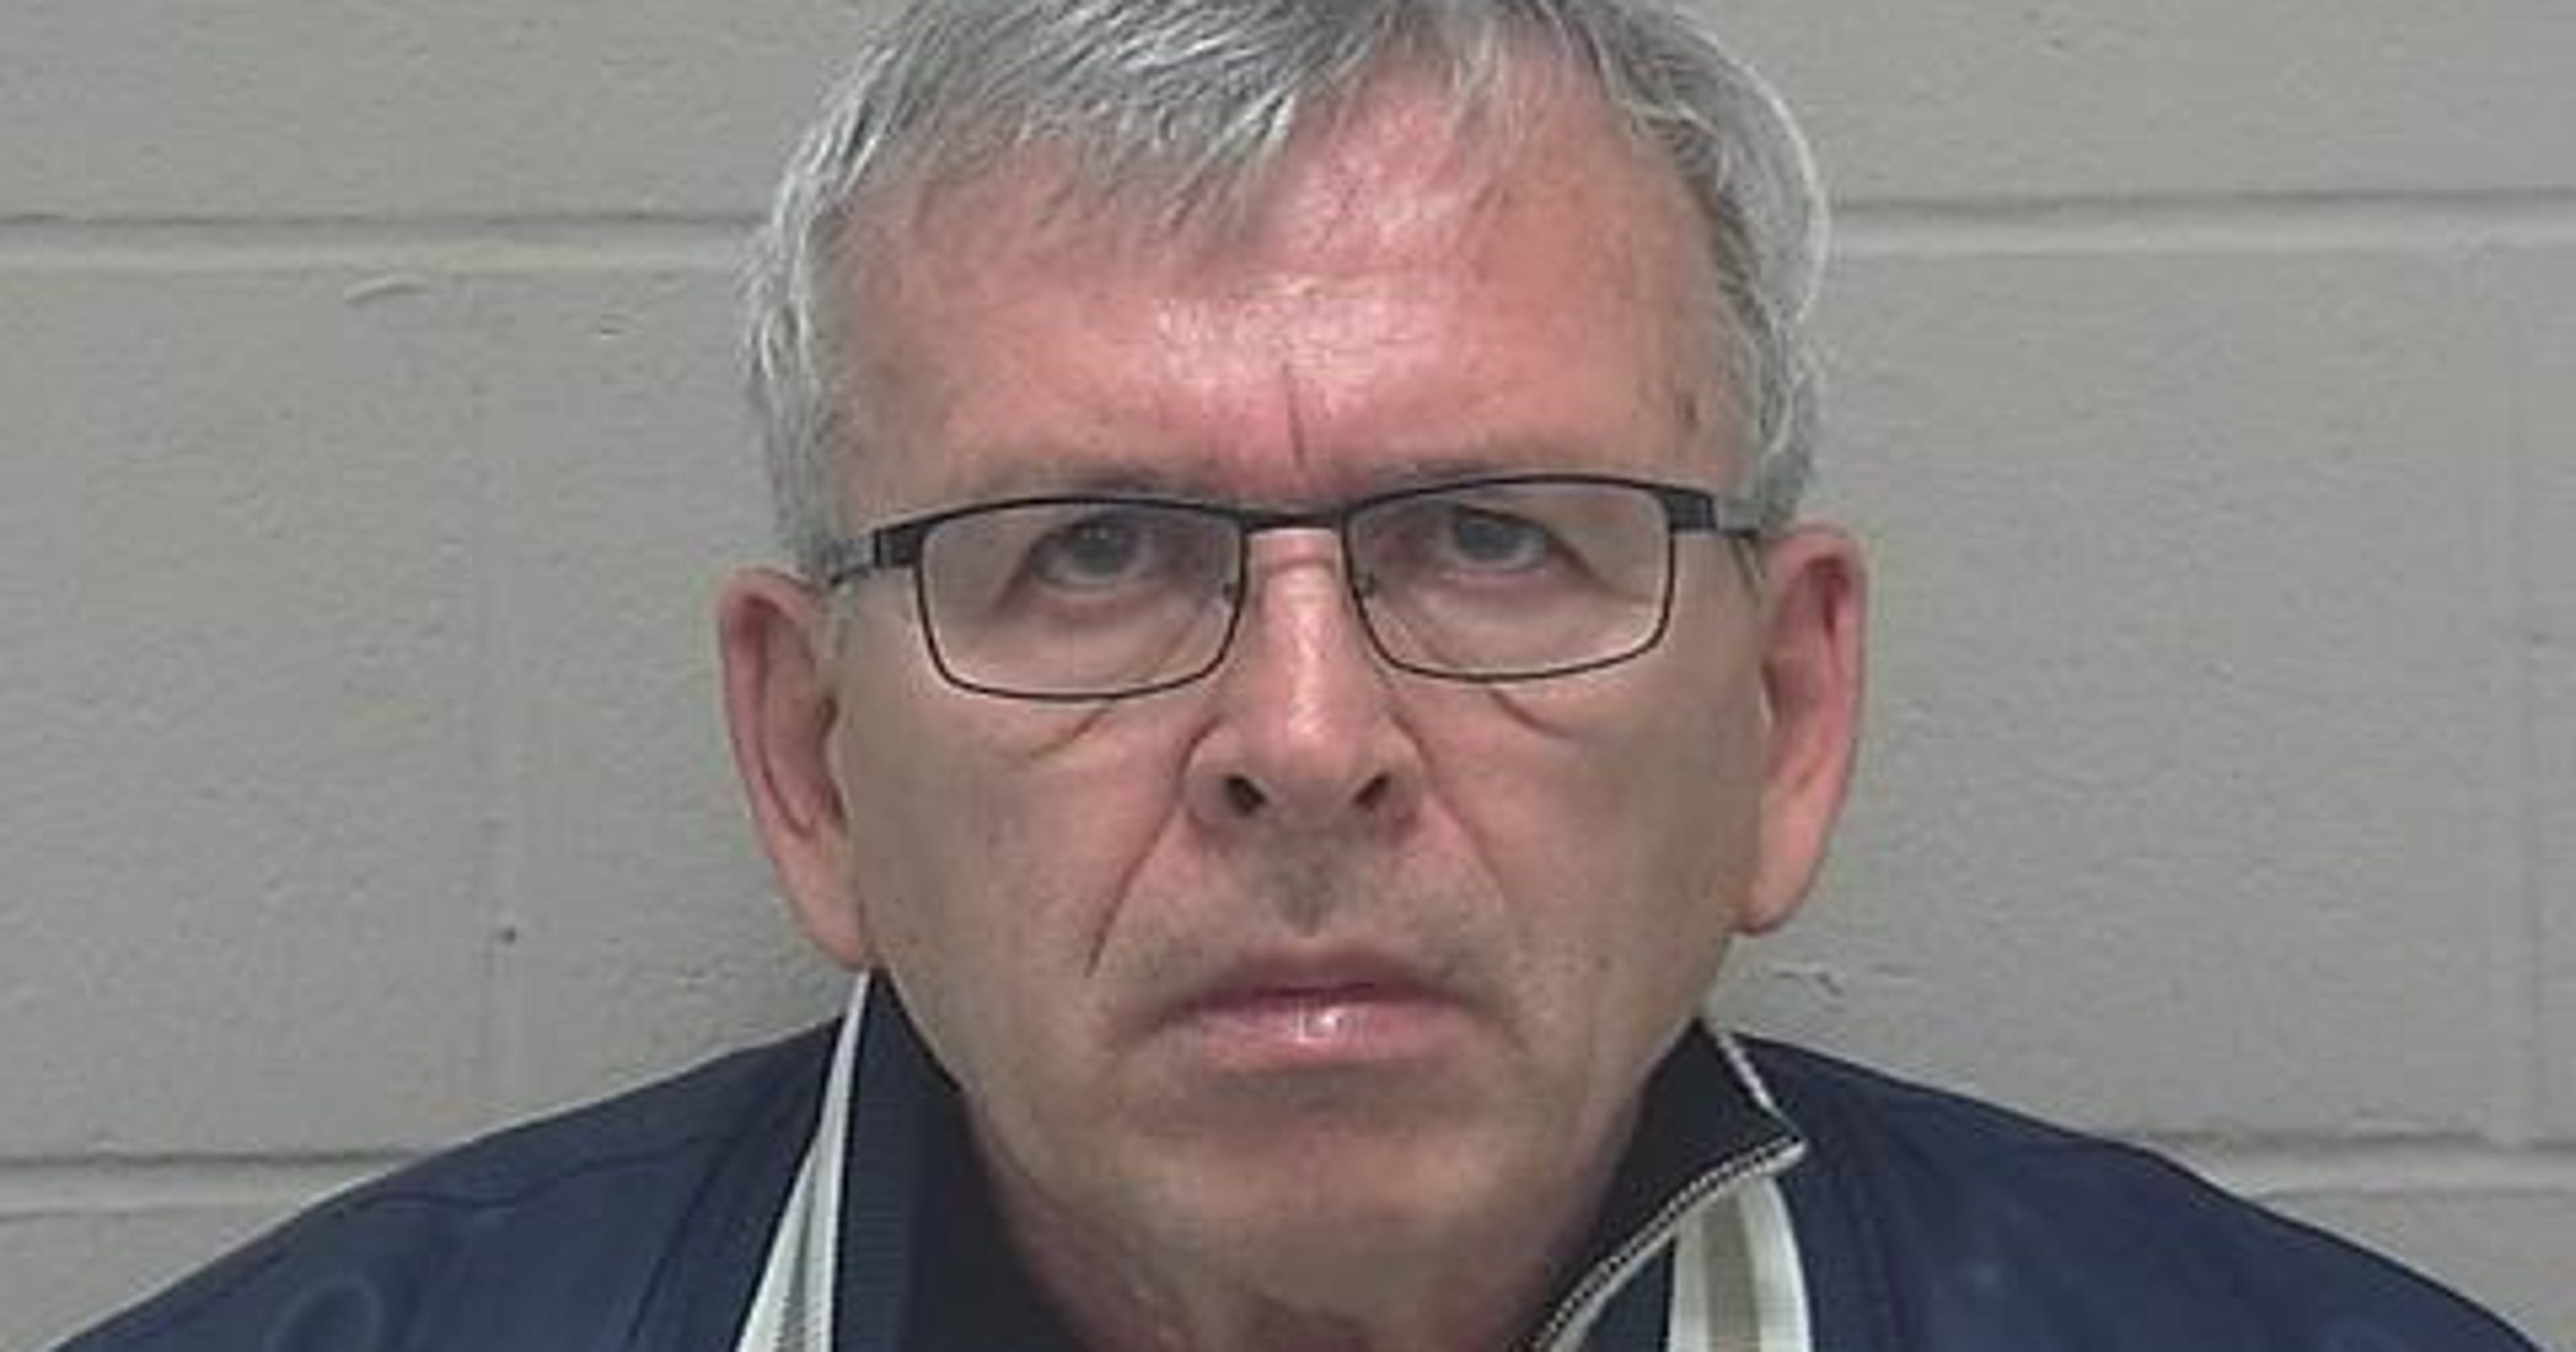 Church treasurer gets probation for embezzling